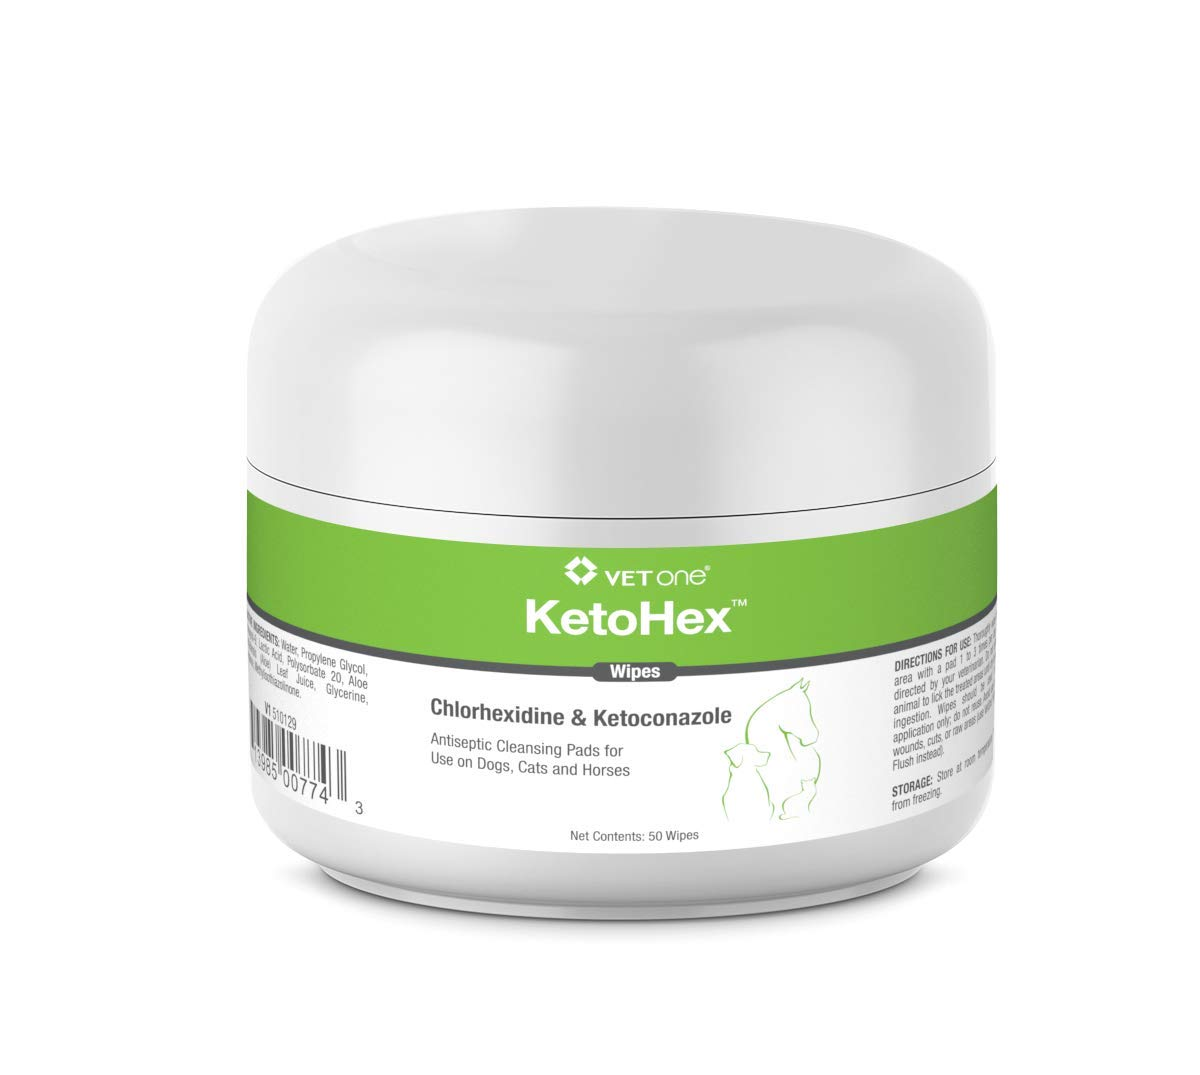 VetOne: KetoHex Antifungal & Antibacterial Veterinary Formulated Wipes for Dogs, Cats, Horses, 50-Count Jar